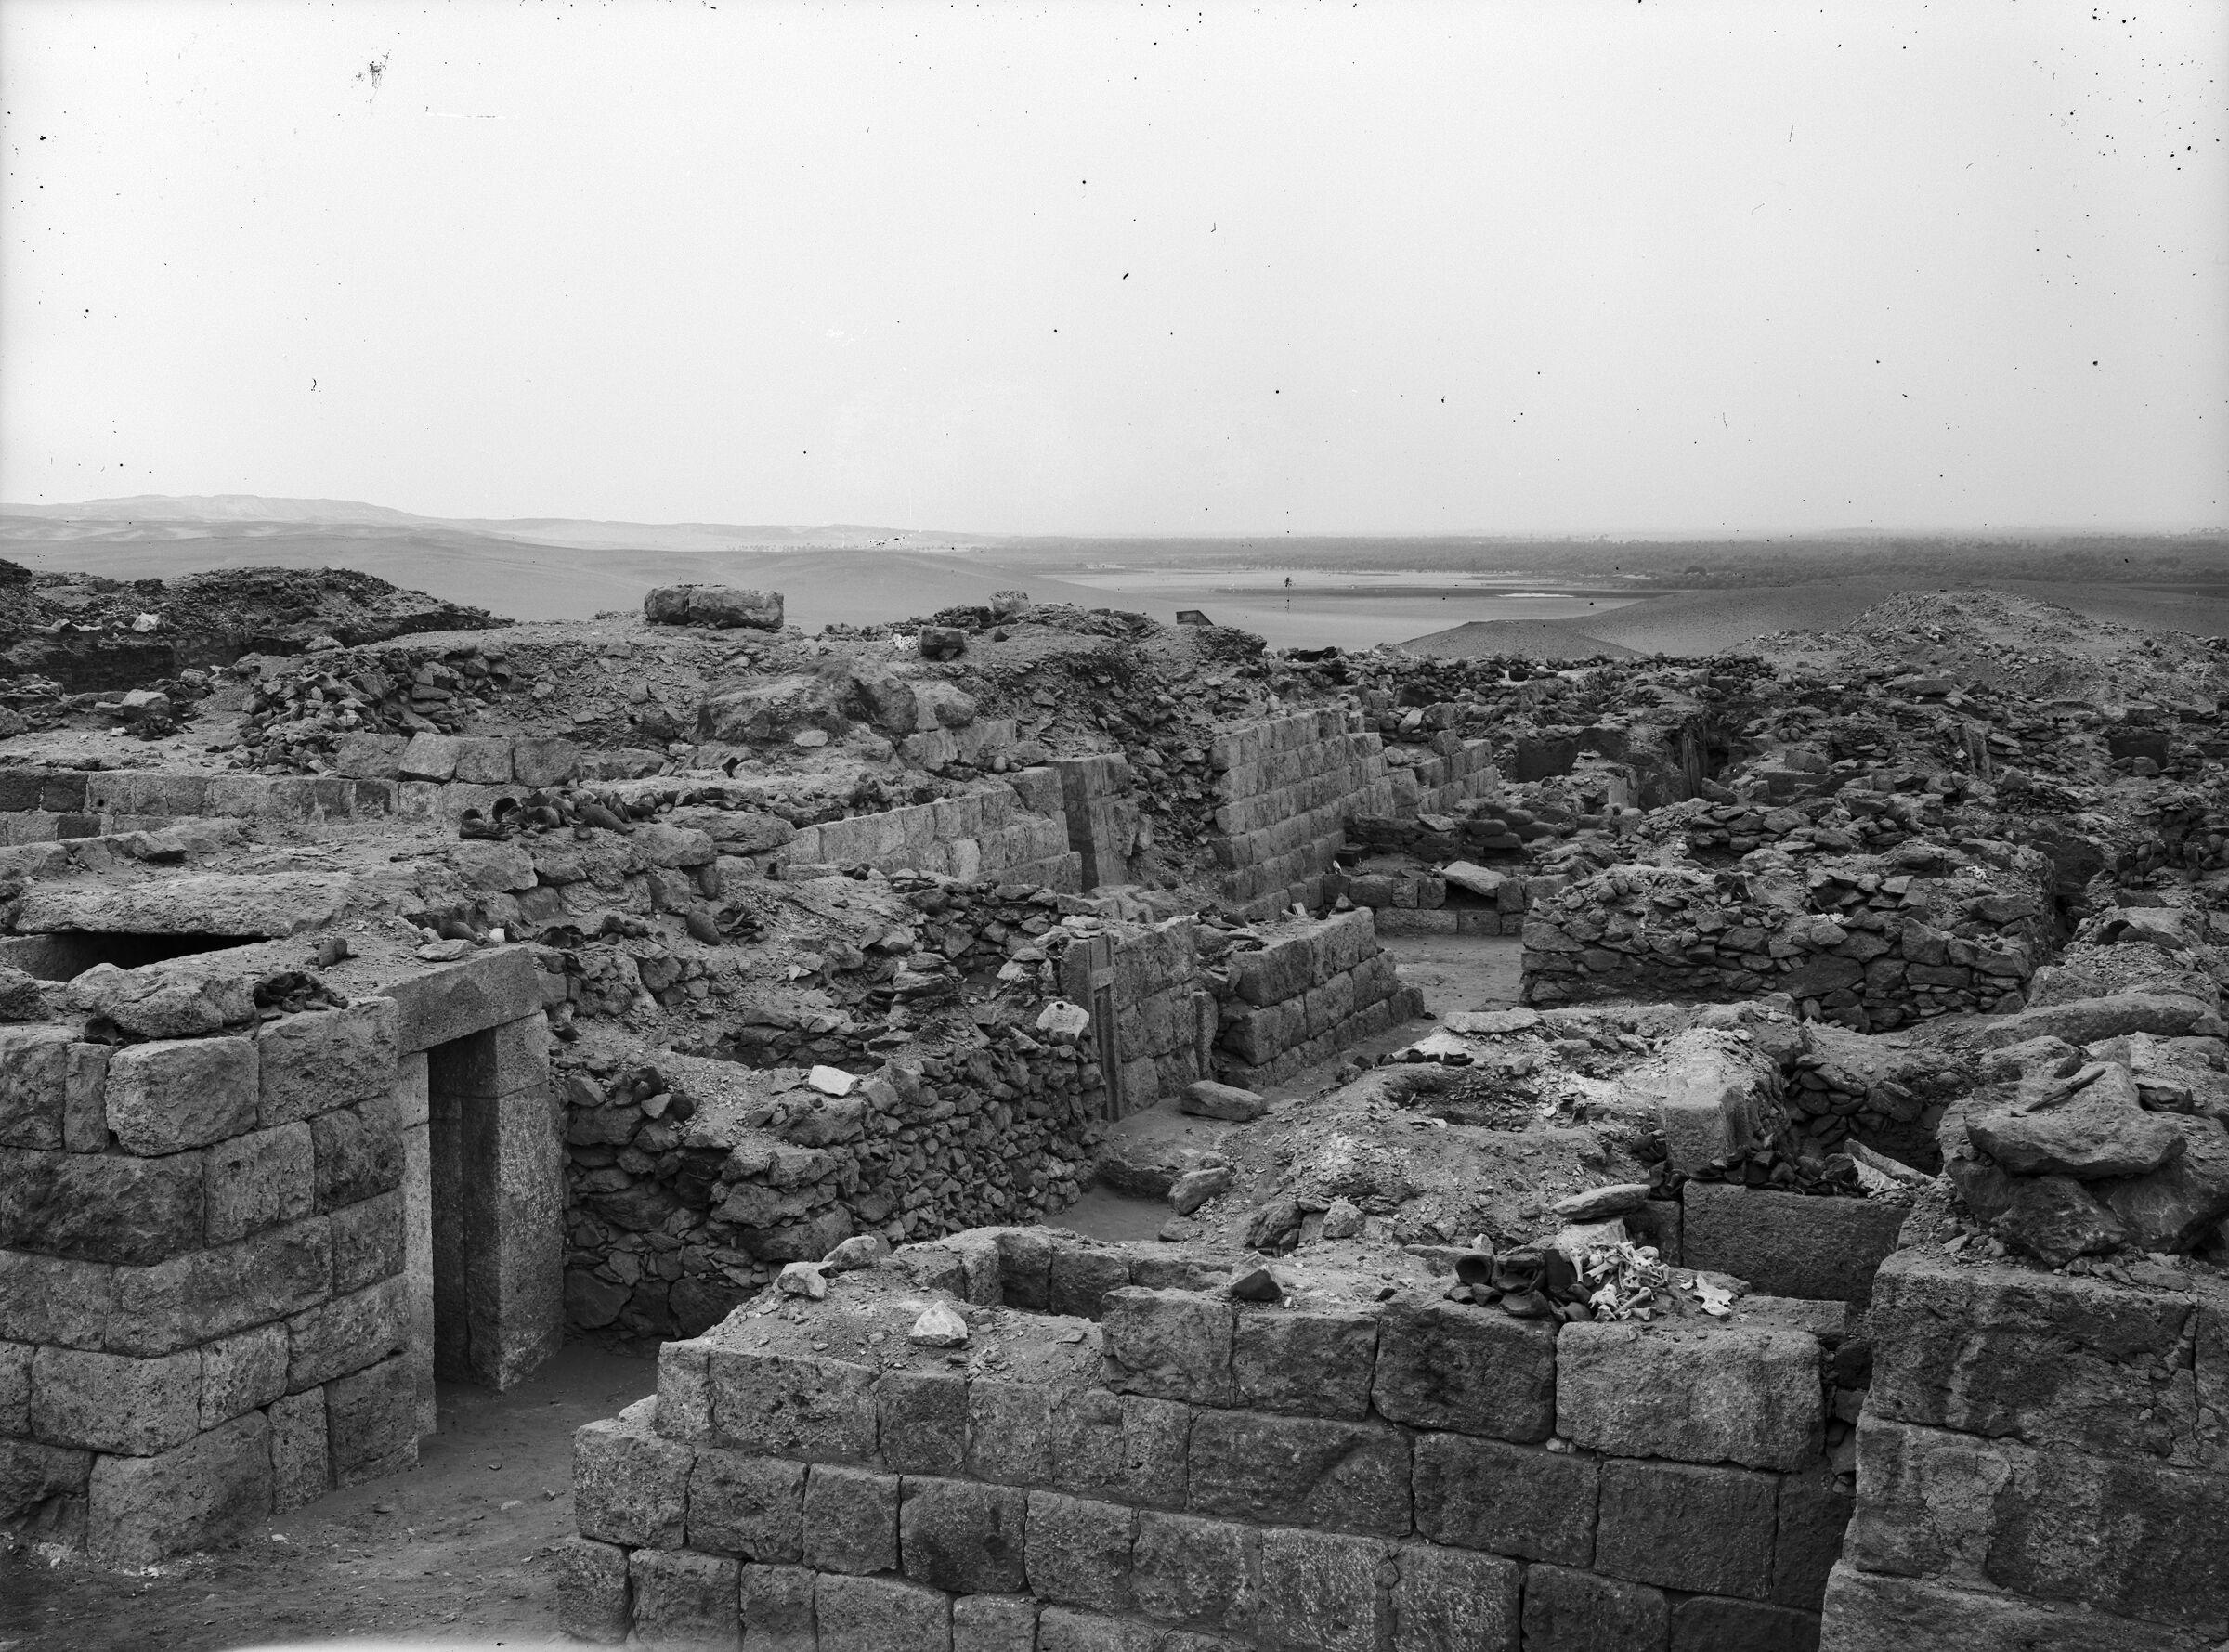 Western Cemetery: Site: Giza; View: G 1013, G 1021, G 1016, G 1018, G 1020, G 1019